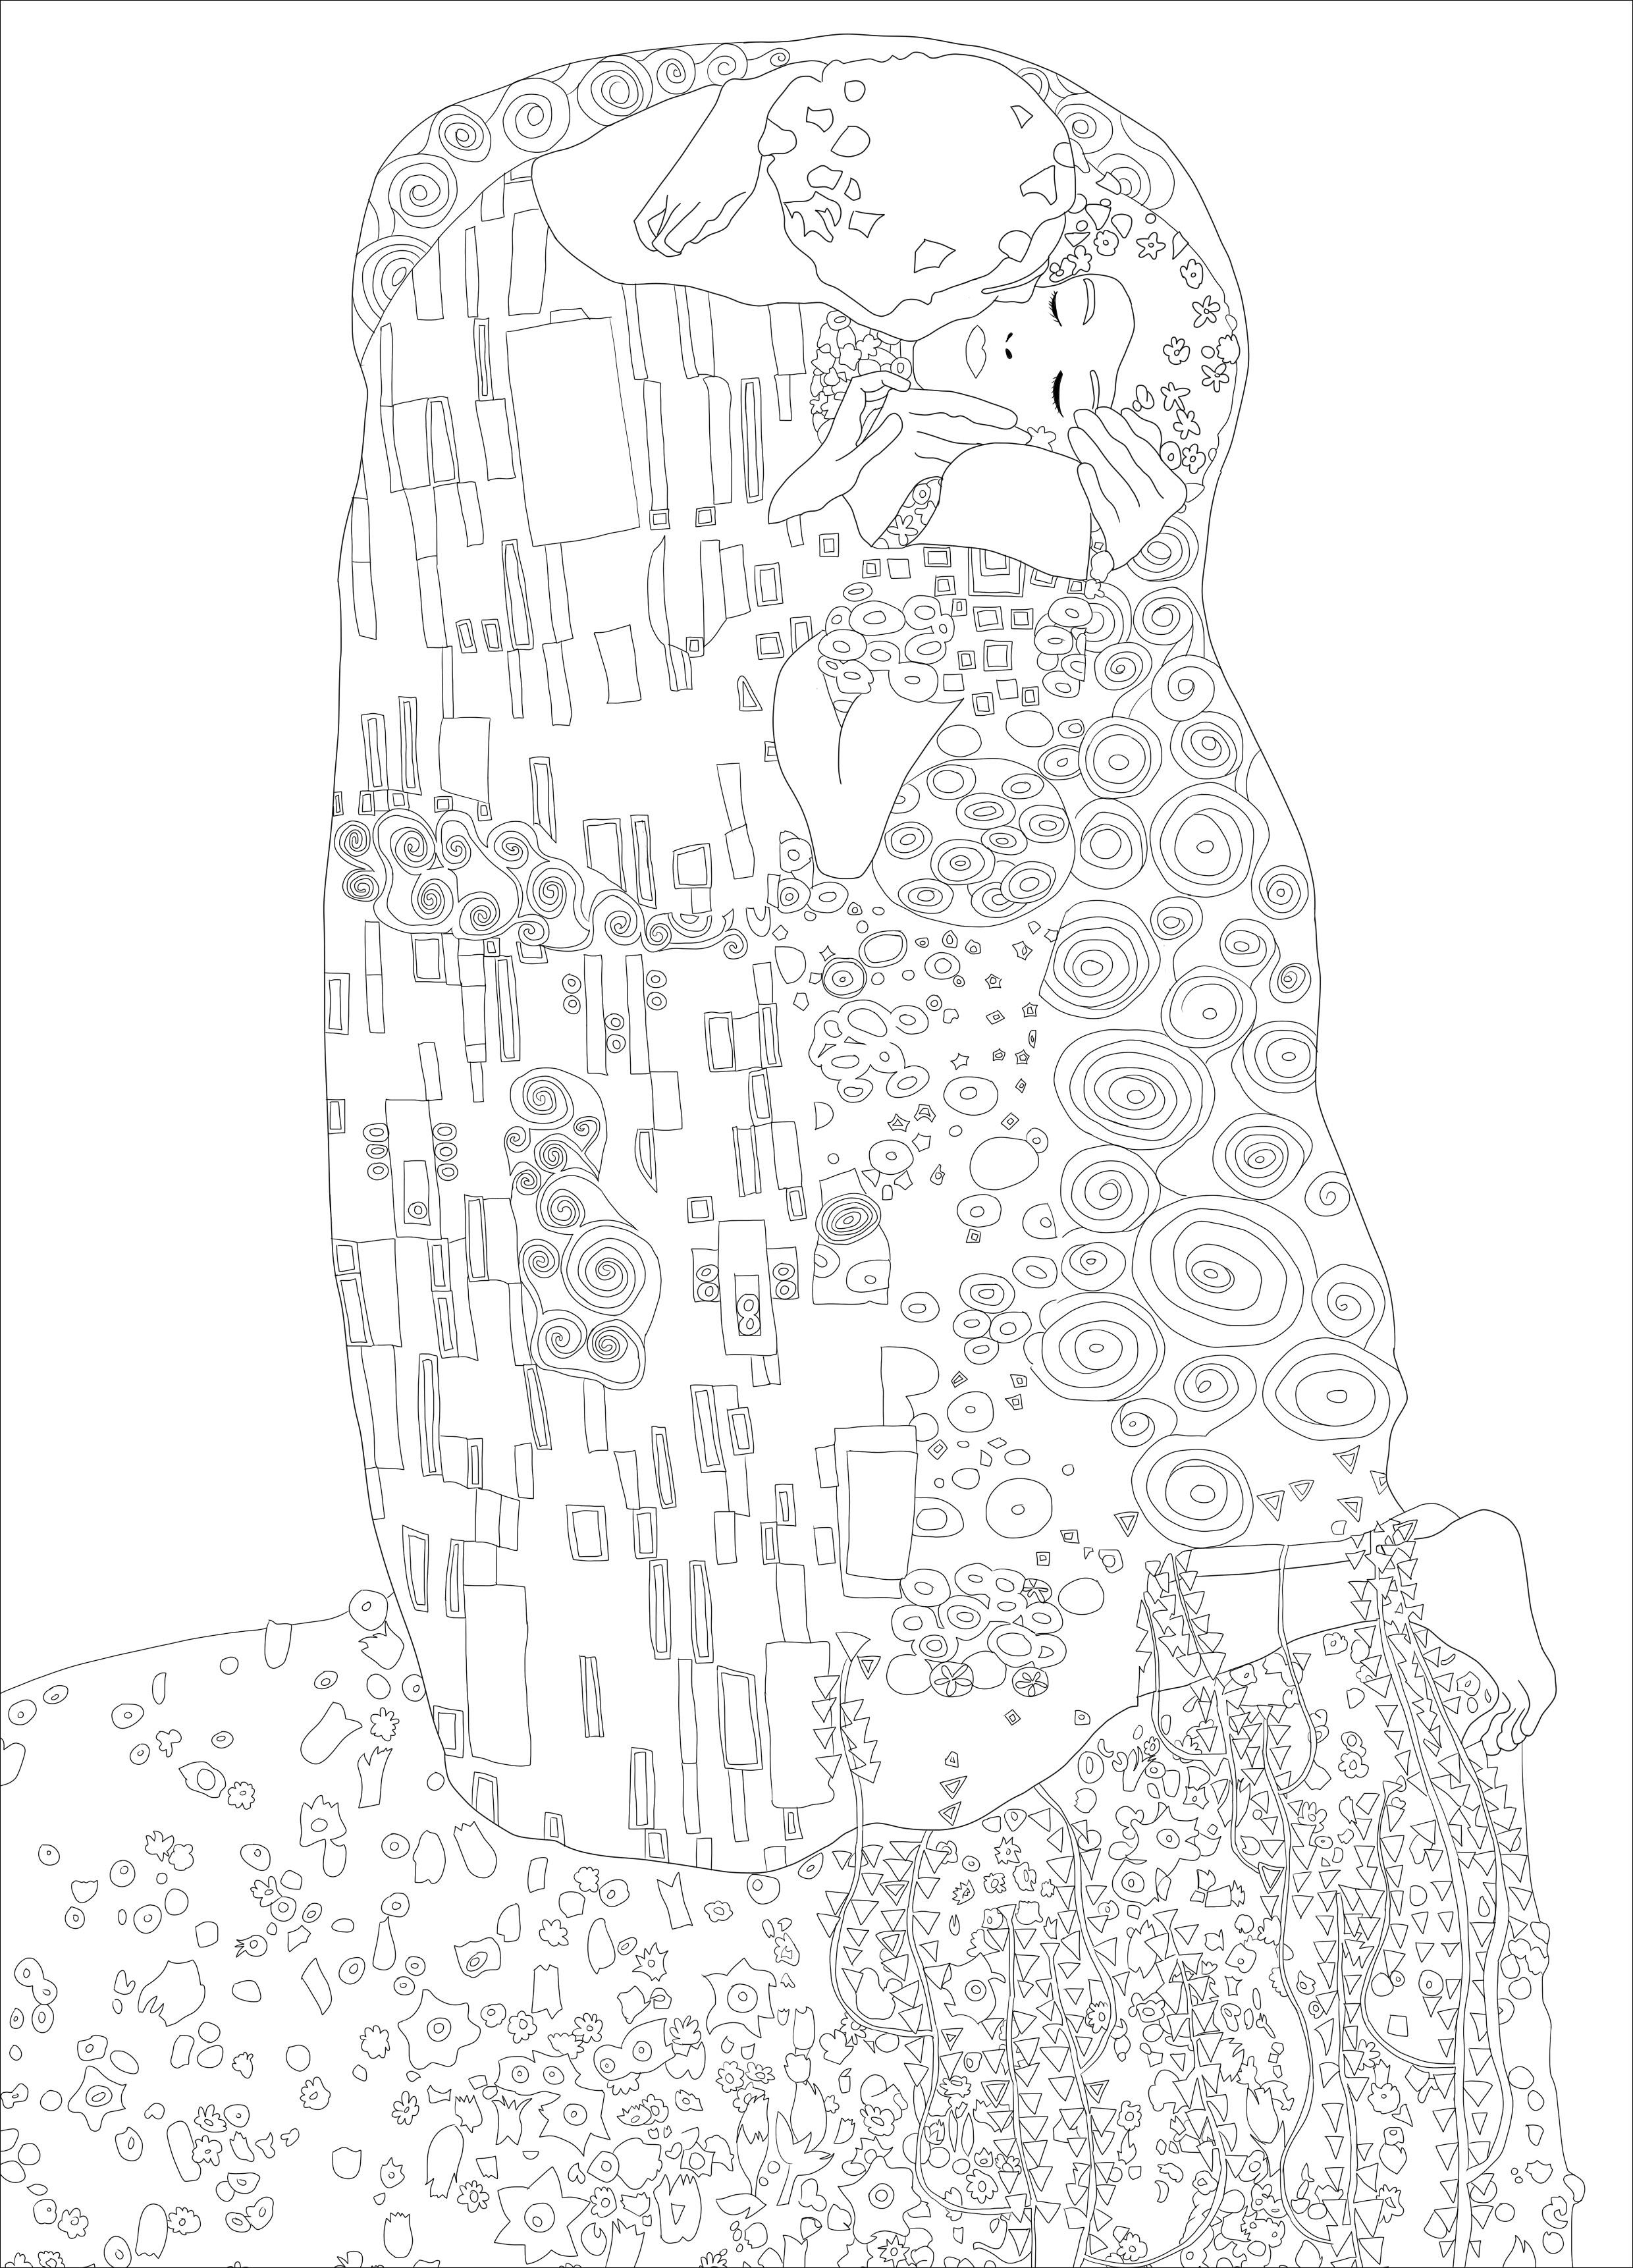 Disegni da colorare per adulti : Opera d arte - 75